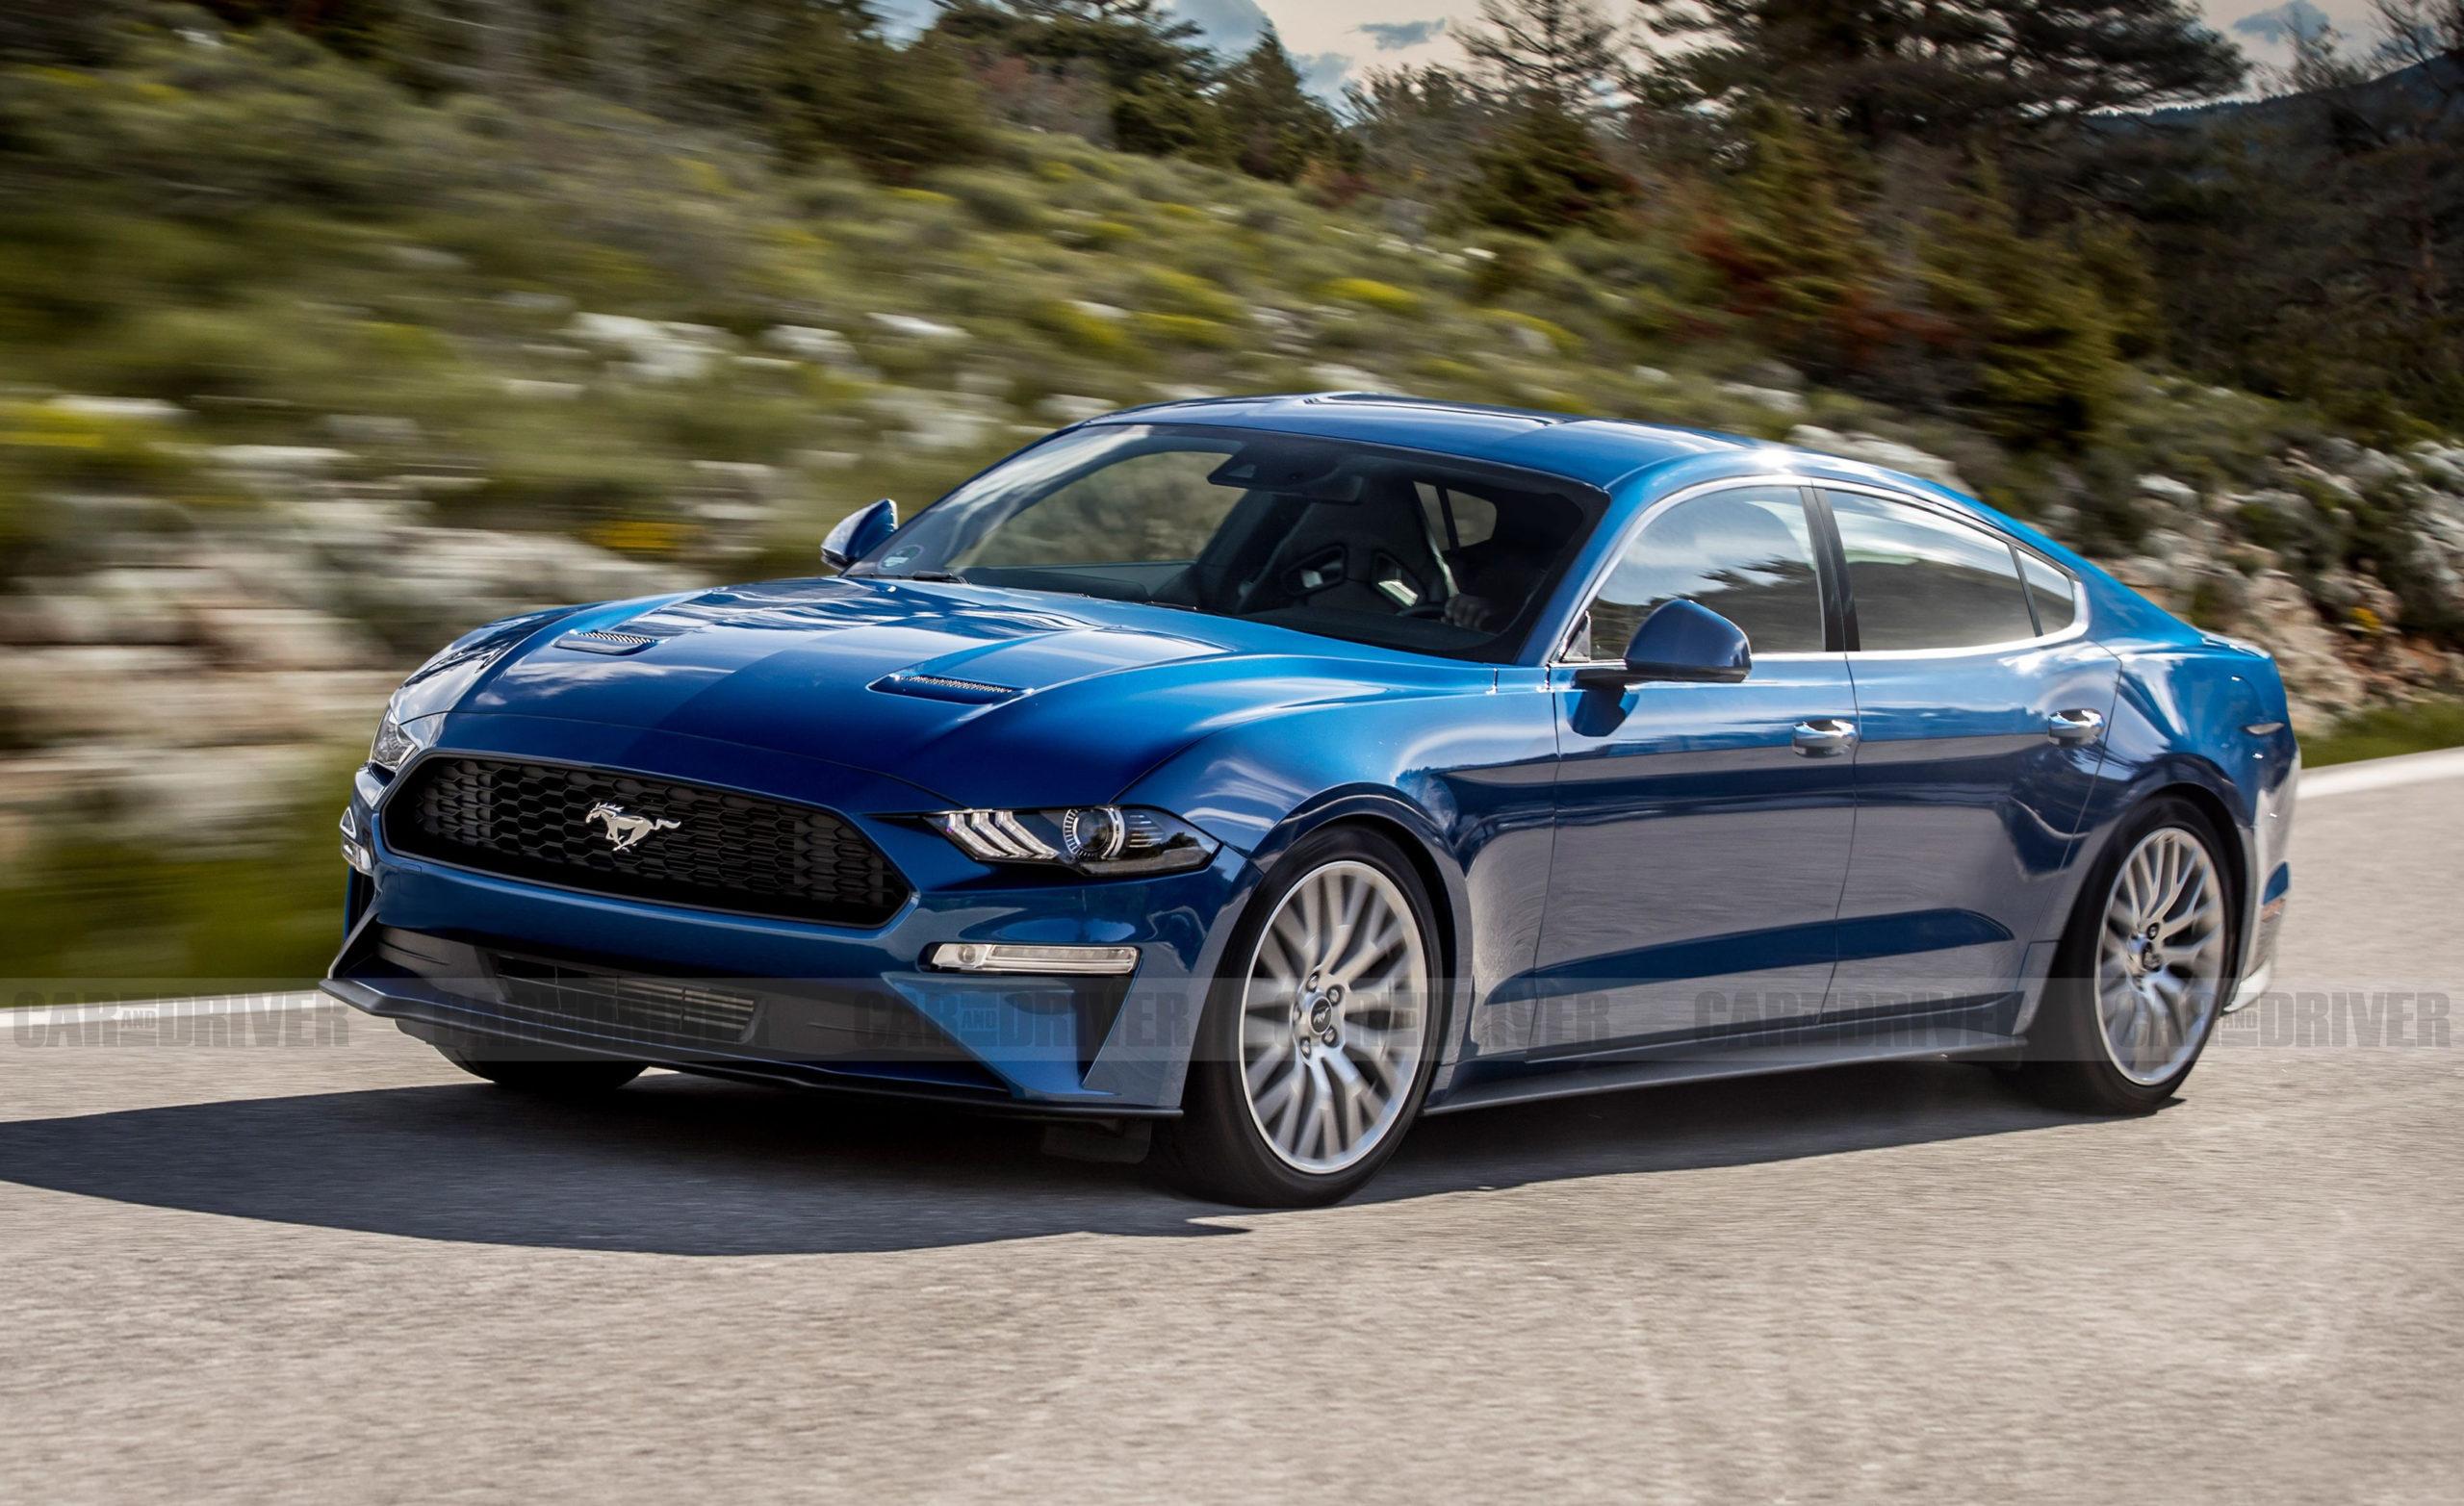 Ford Mustang Four-Door – Rumors Of A New Pony-Car Sedan